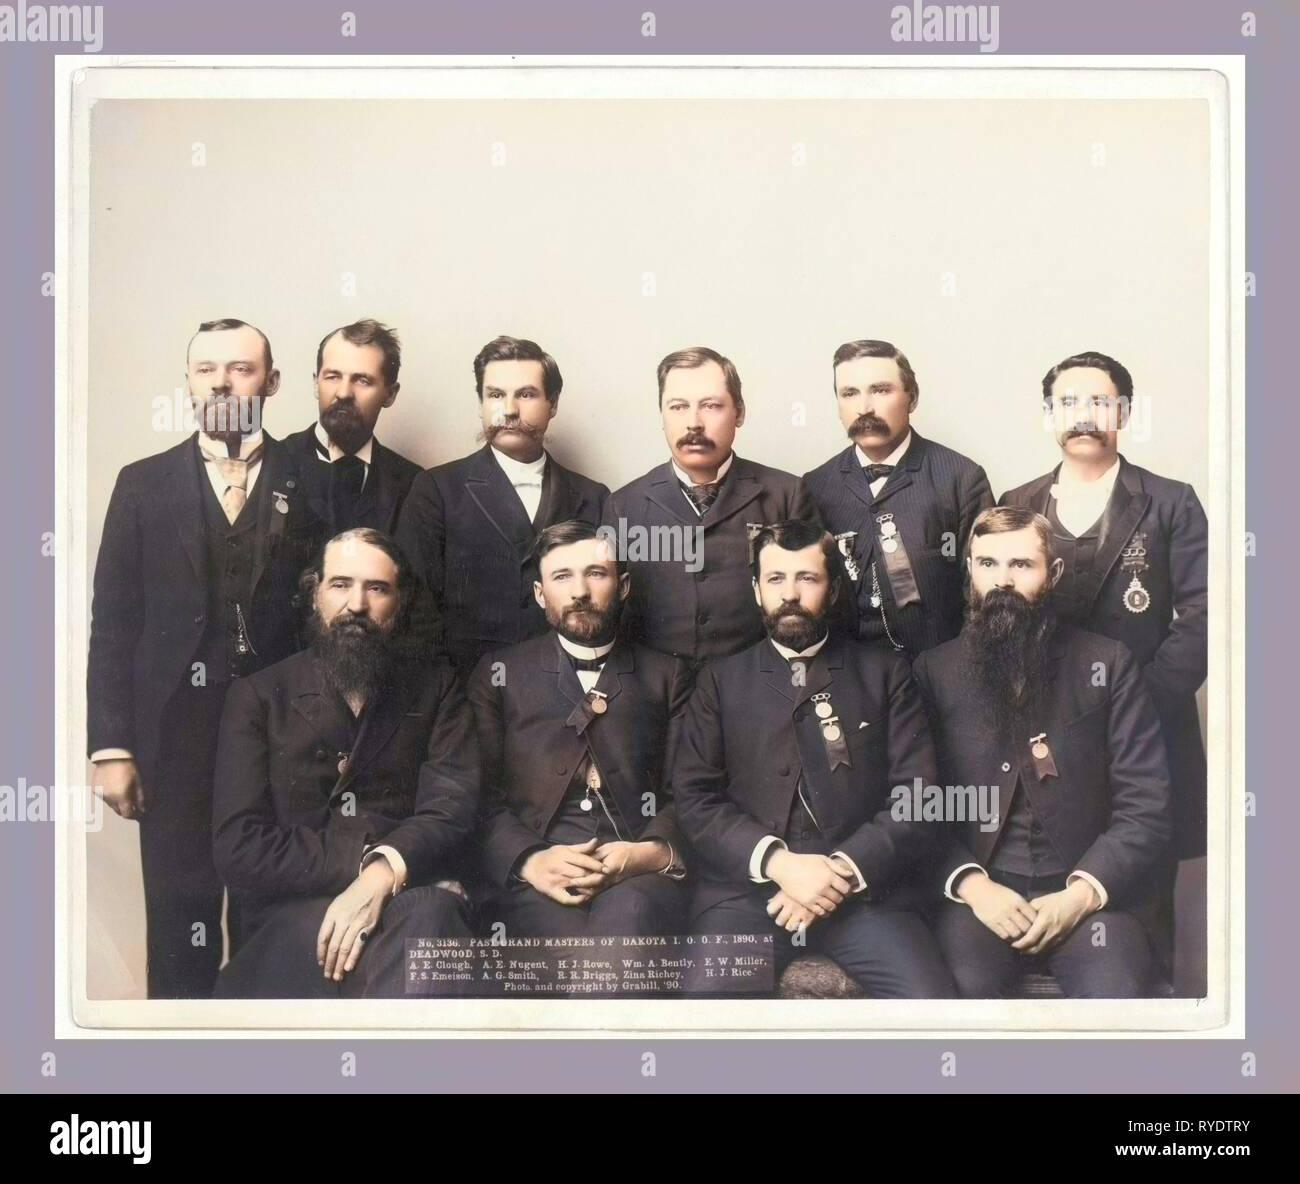 Past Grand Masters of Dakota I.O.O. F., 1890, at Deadwood, S.D. A.E. Clough, A.E.Nugent, H.J. Rowe, Wm. A. Bently, F.W. Miller, F.S. Emeison. A.G. Smith, R.R. Briggs, Zina Richey, H.J. Rice - Stock Image